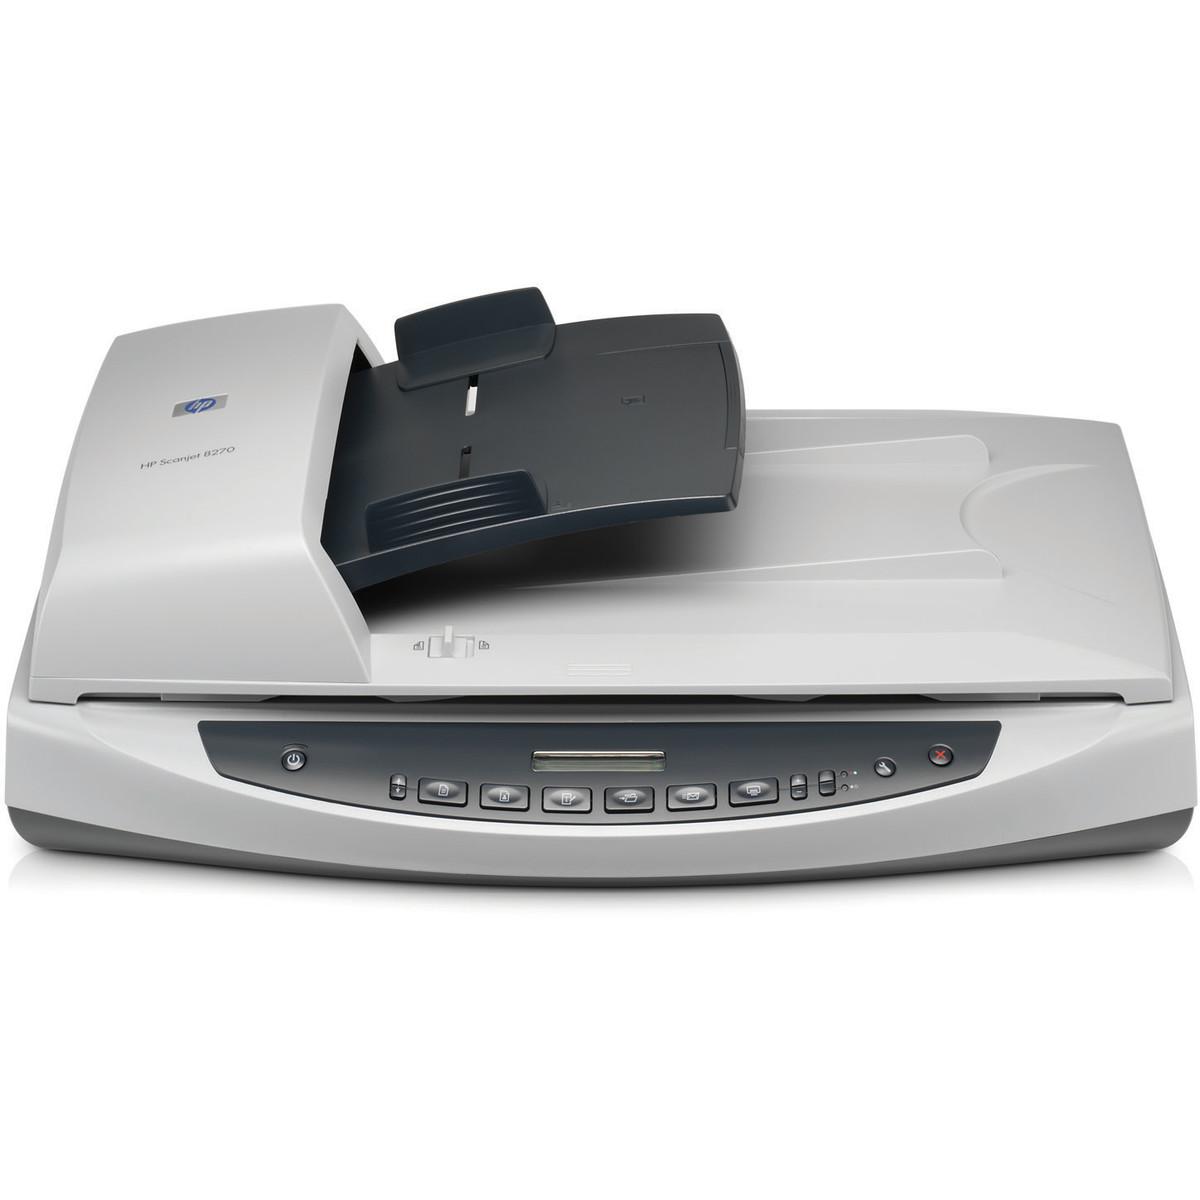 Hp 8270 scanner